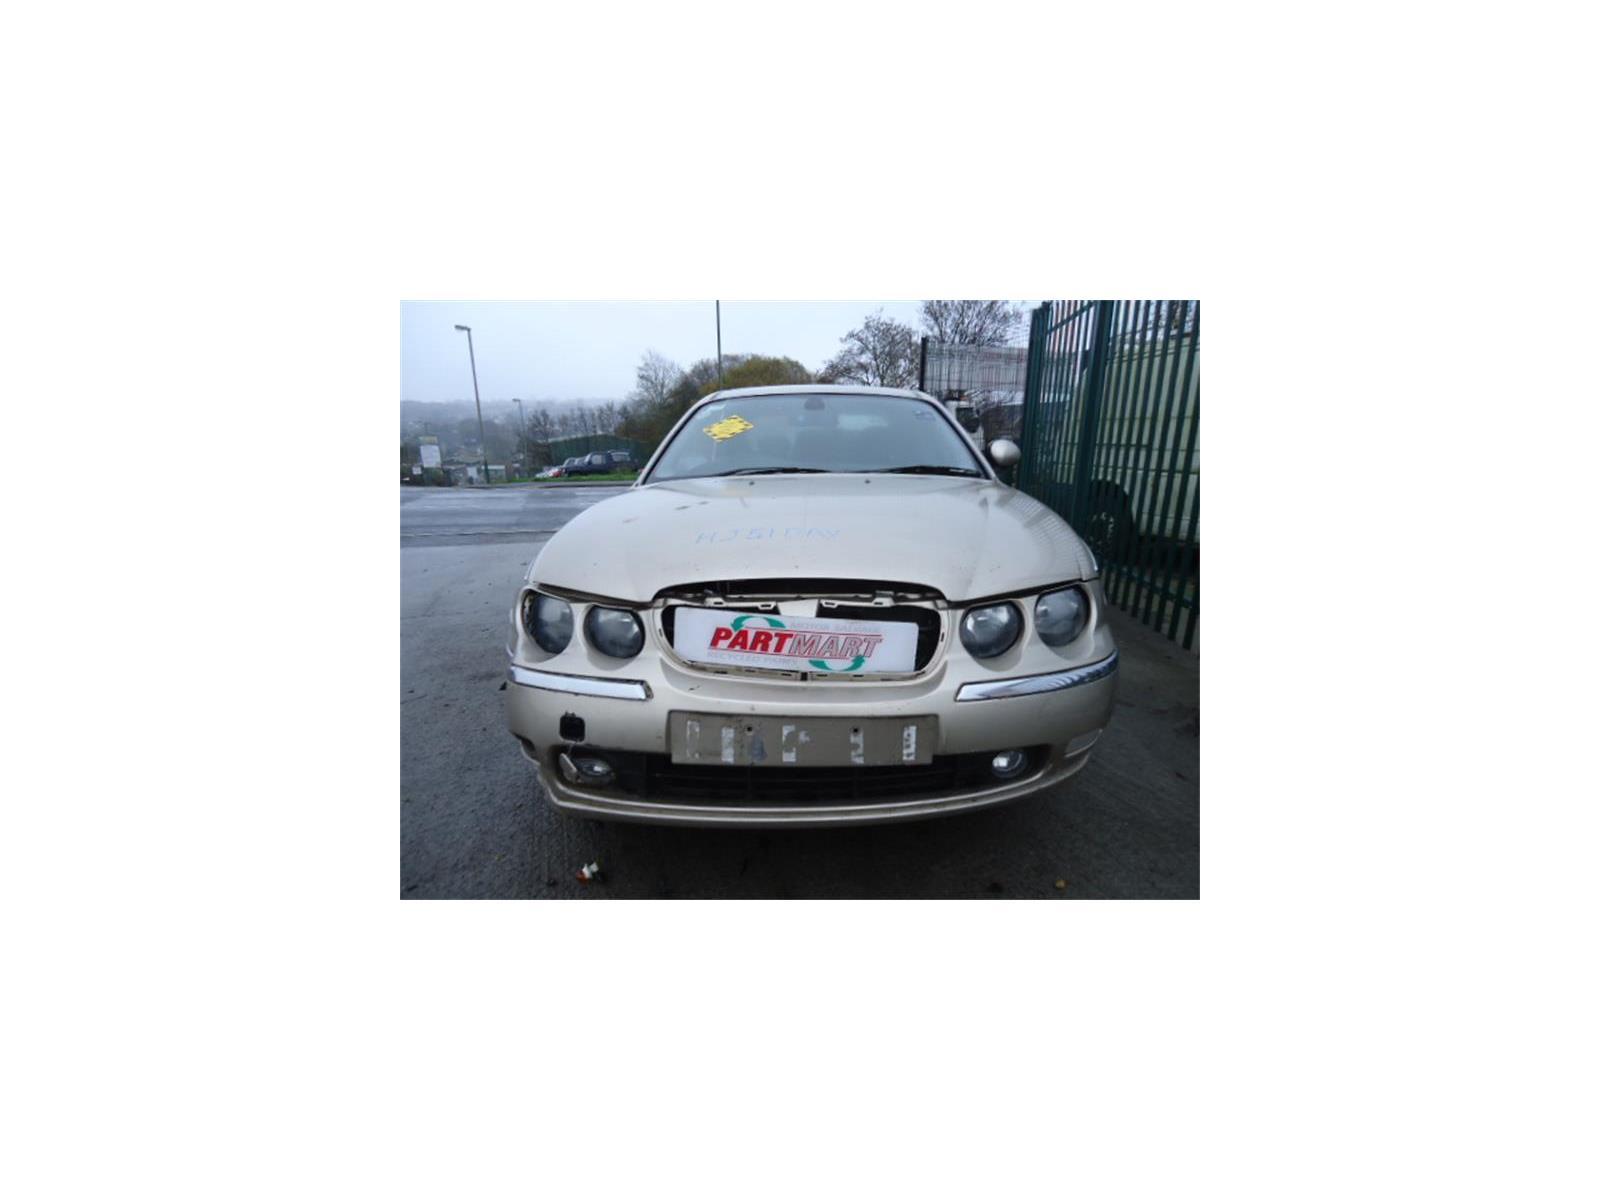 2004 rover 75 1999 to 2004 4 door saloon petrol manual breaking rh partmart co uk rover 75 parts catalog rover 75 parts catalog